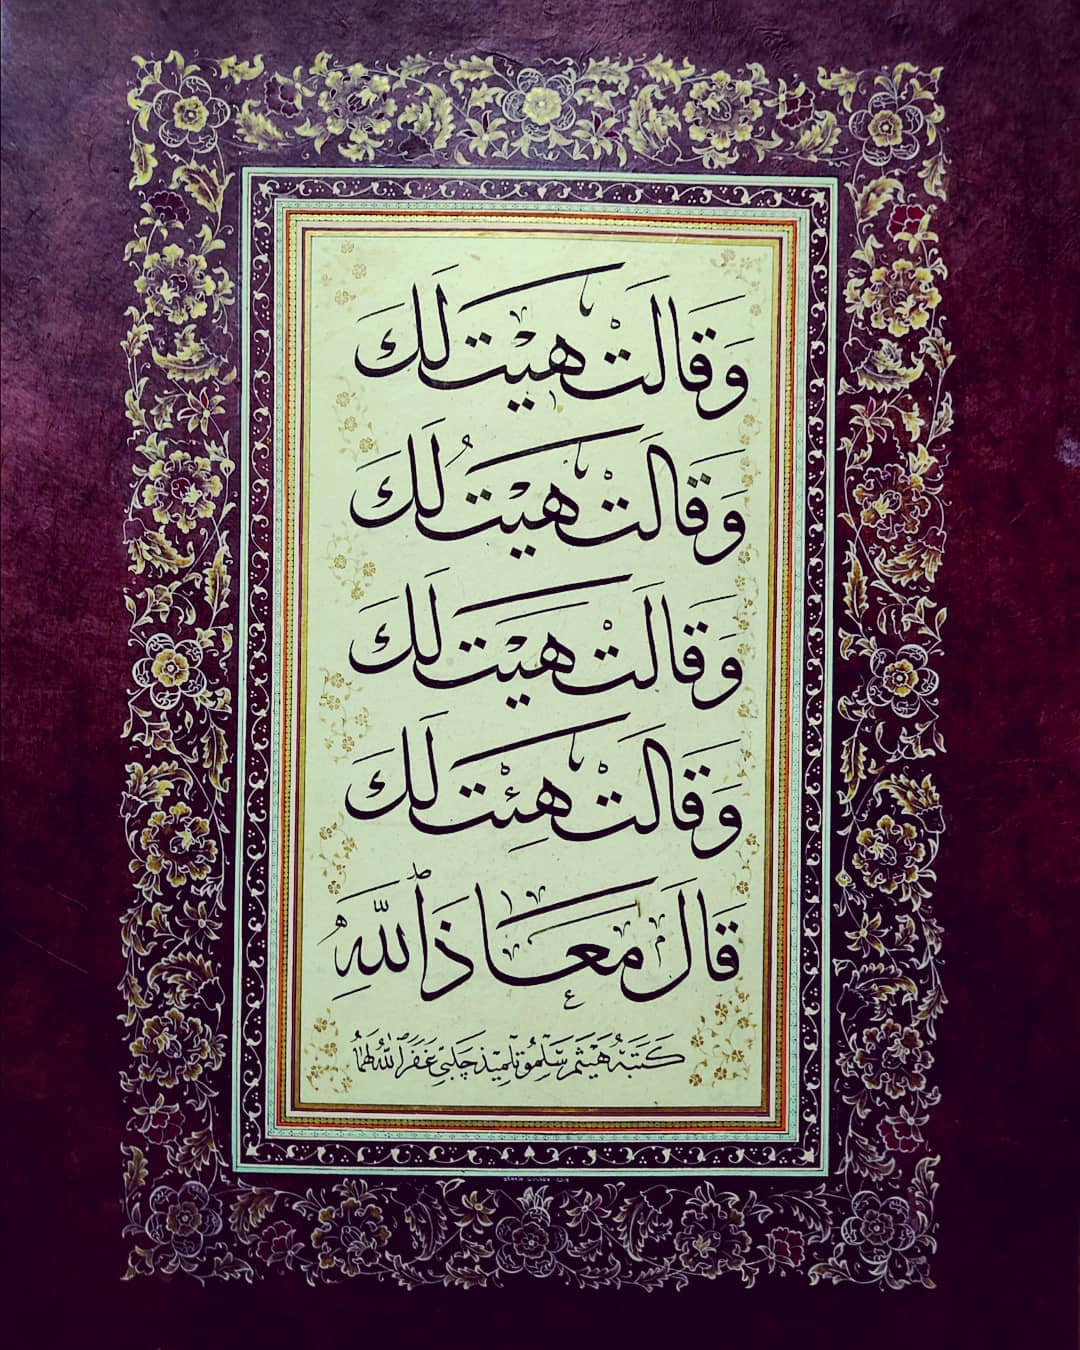 Works Calligraphy Haythamsalmo ... 338 1